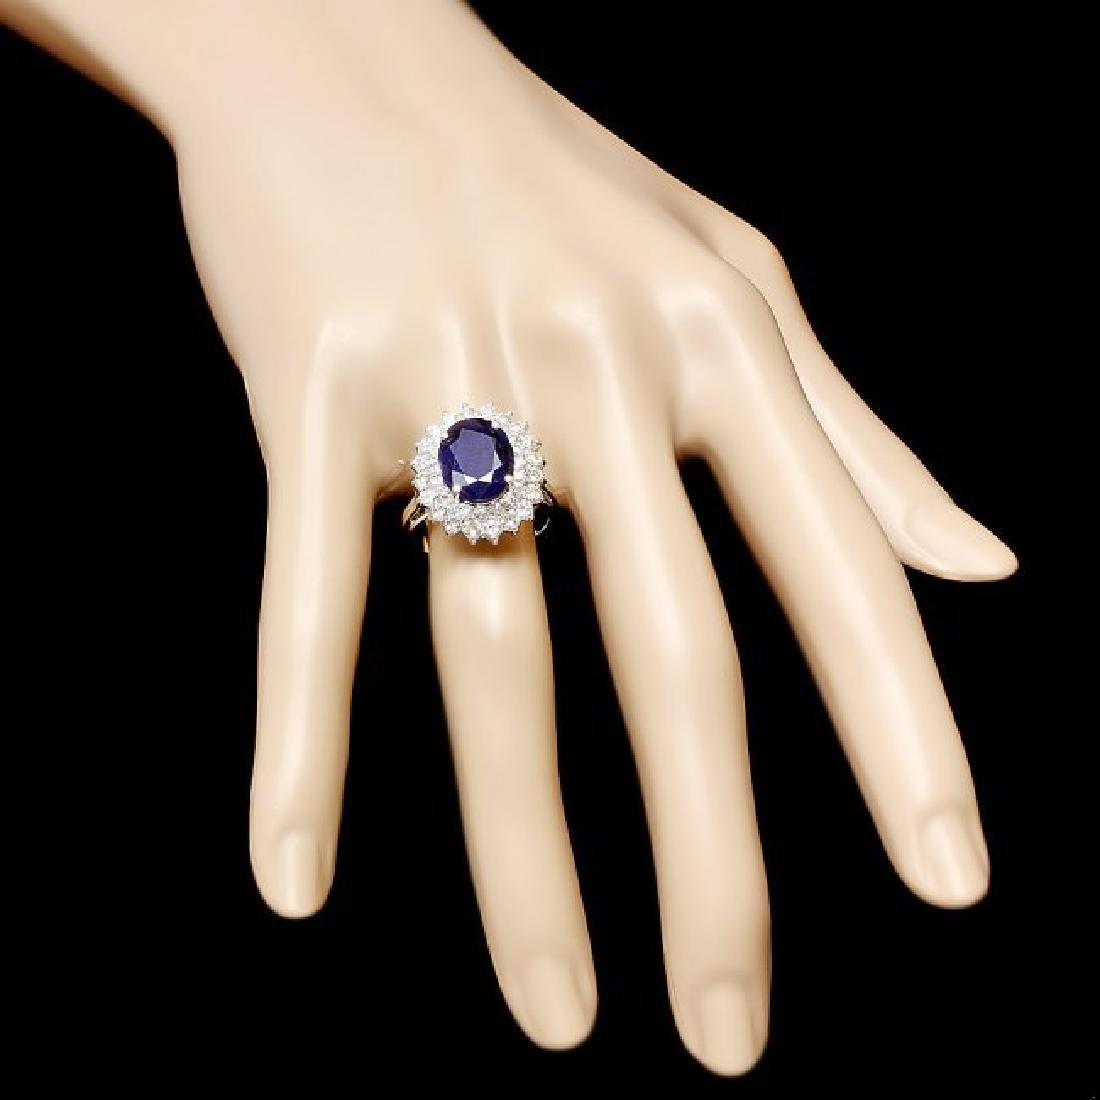 14k Gold 4.00ct Sapphire 1.65ct Diamond Ring - 3